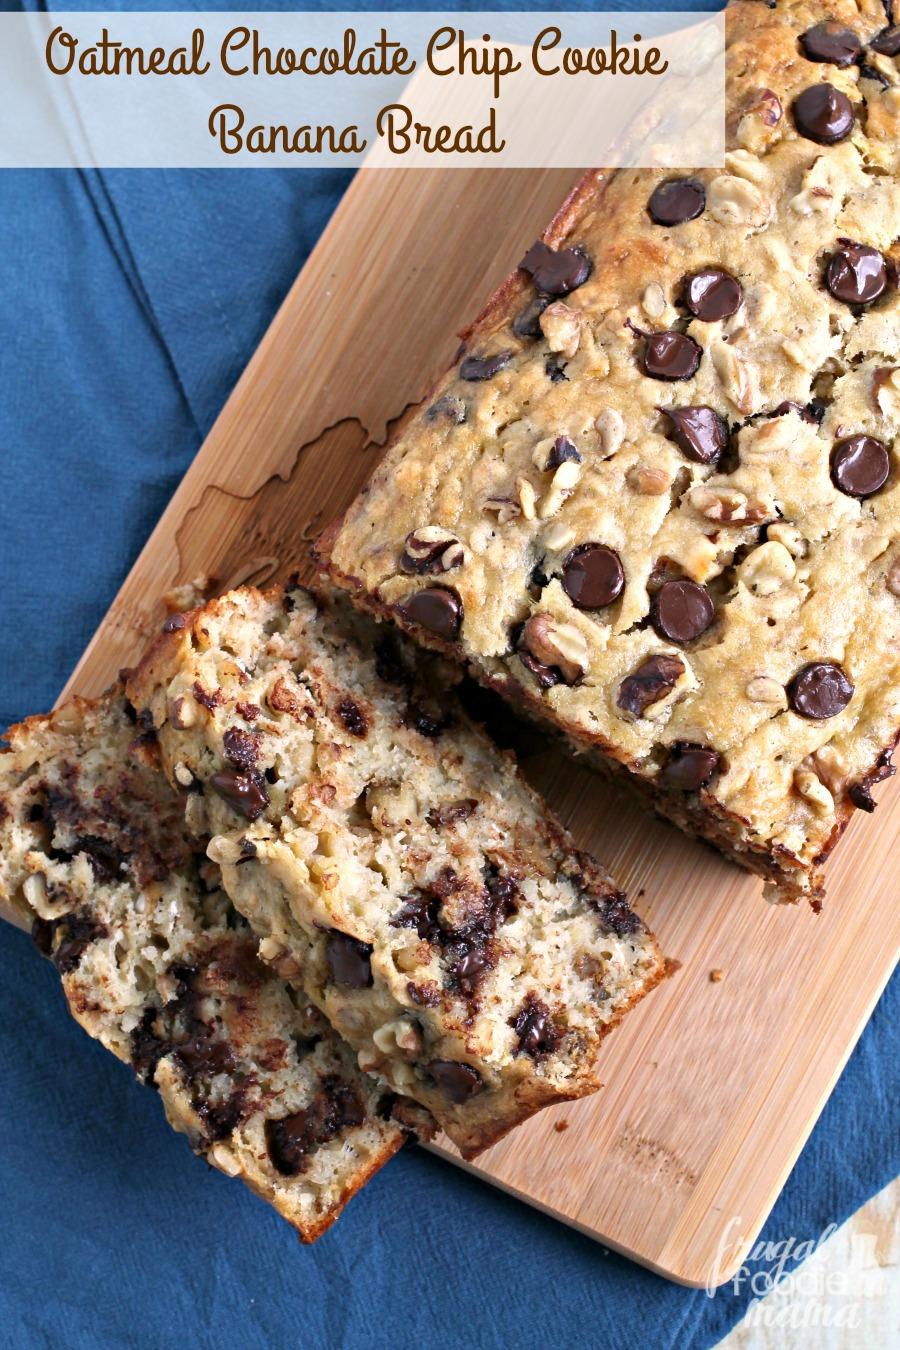 Frugal Foodie Mama: Oatmeal Chocolate Chip Cookie Banana Bread